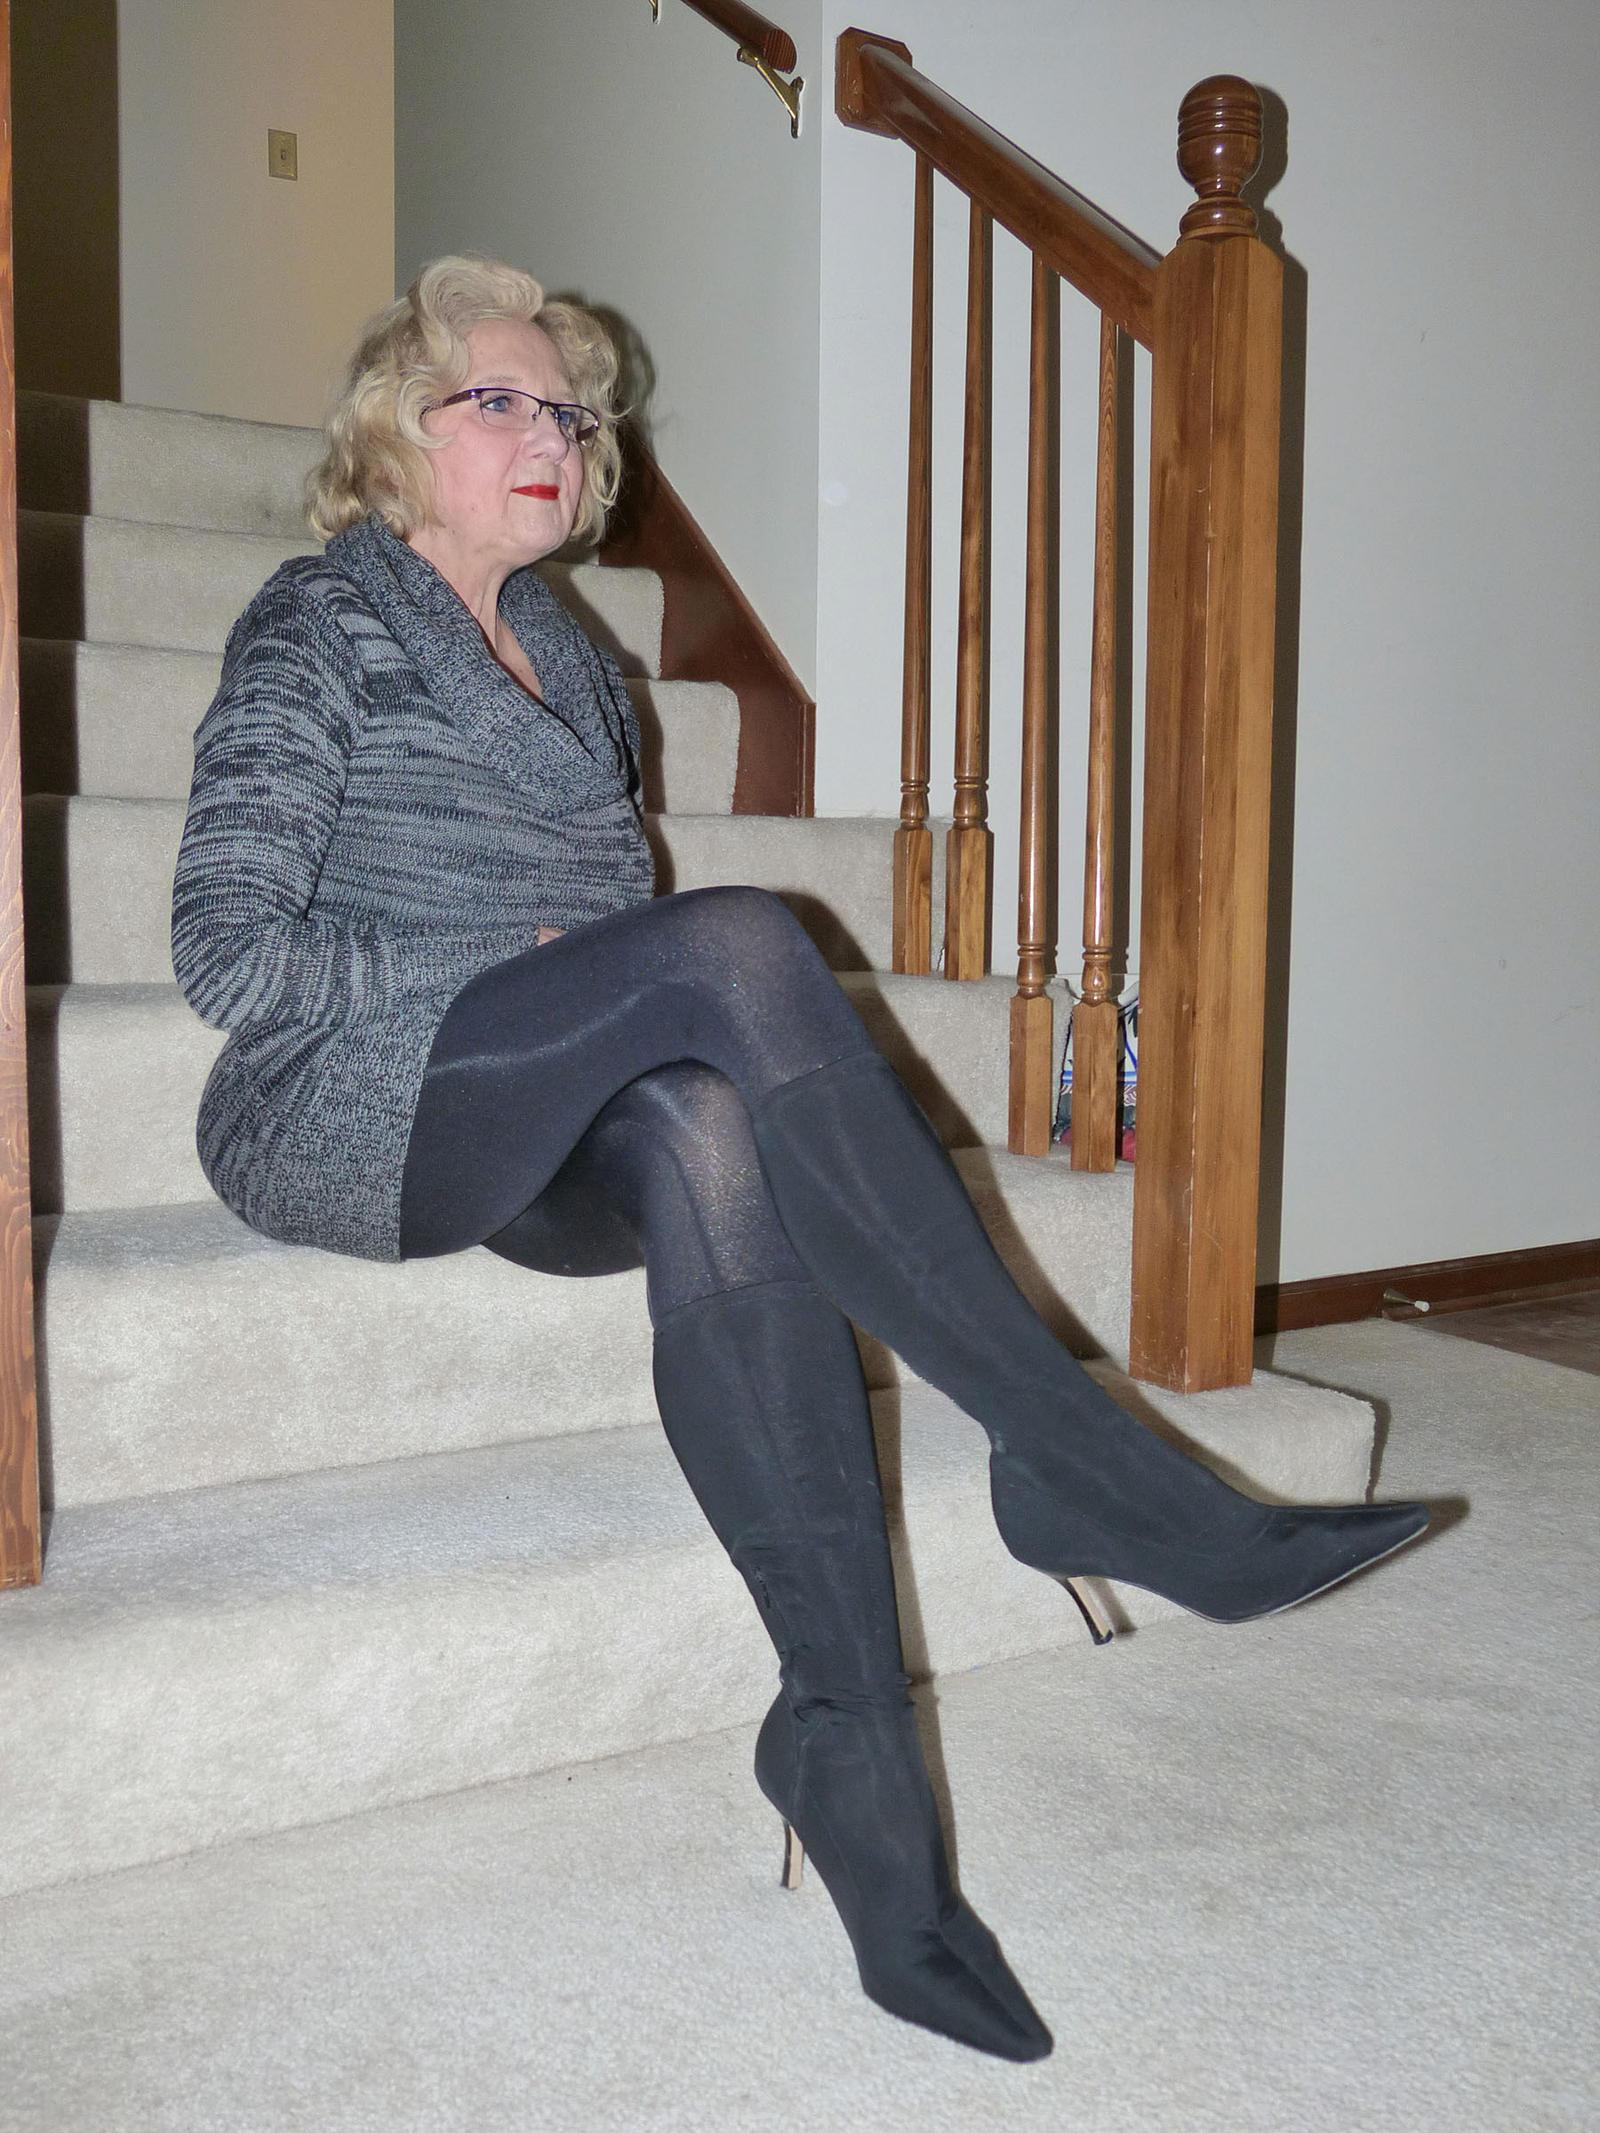 Ladies Wearing Nice Shoes Pics